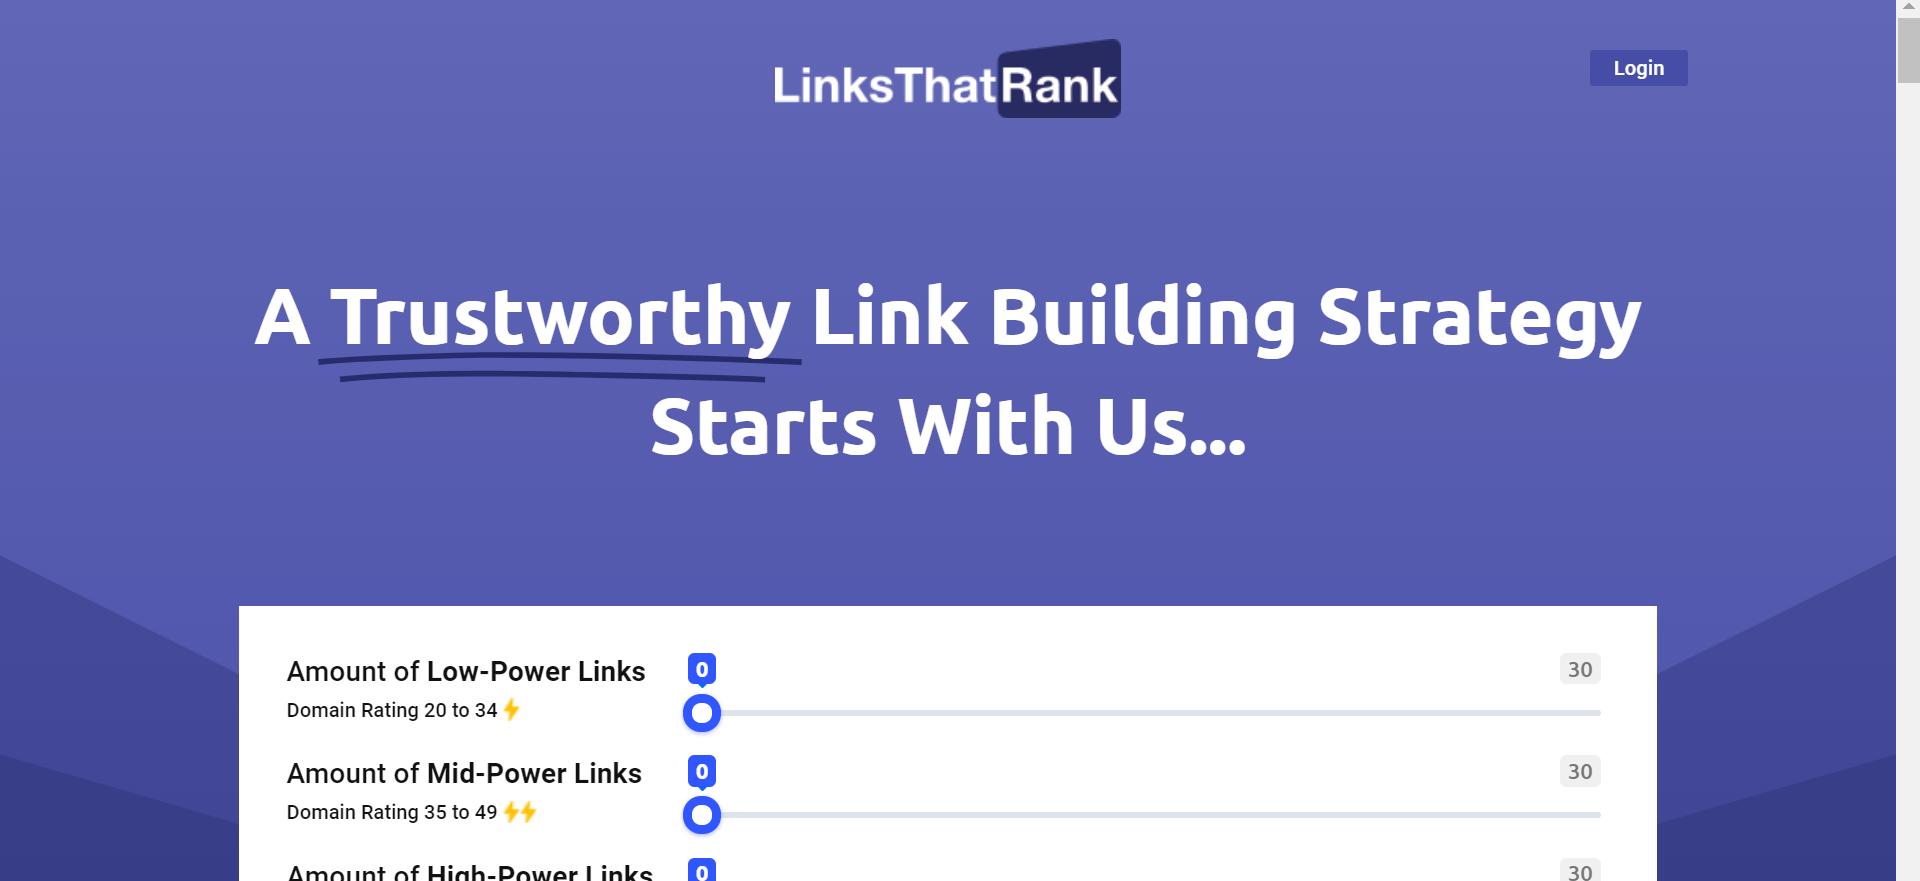 image of website LinksThatRank